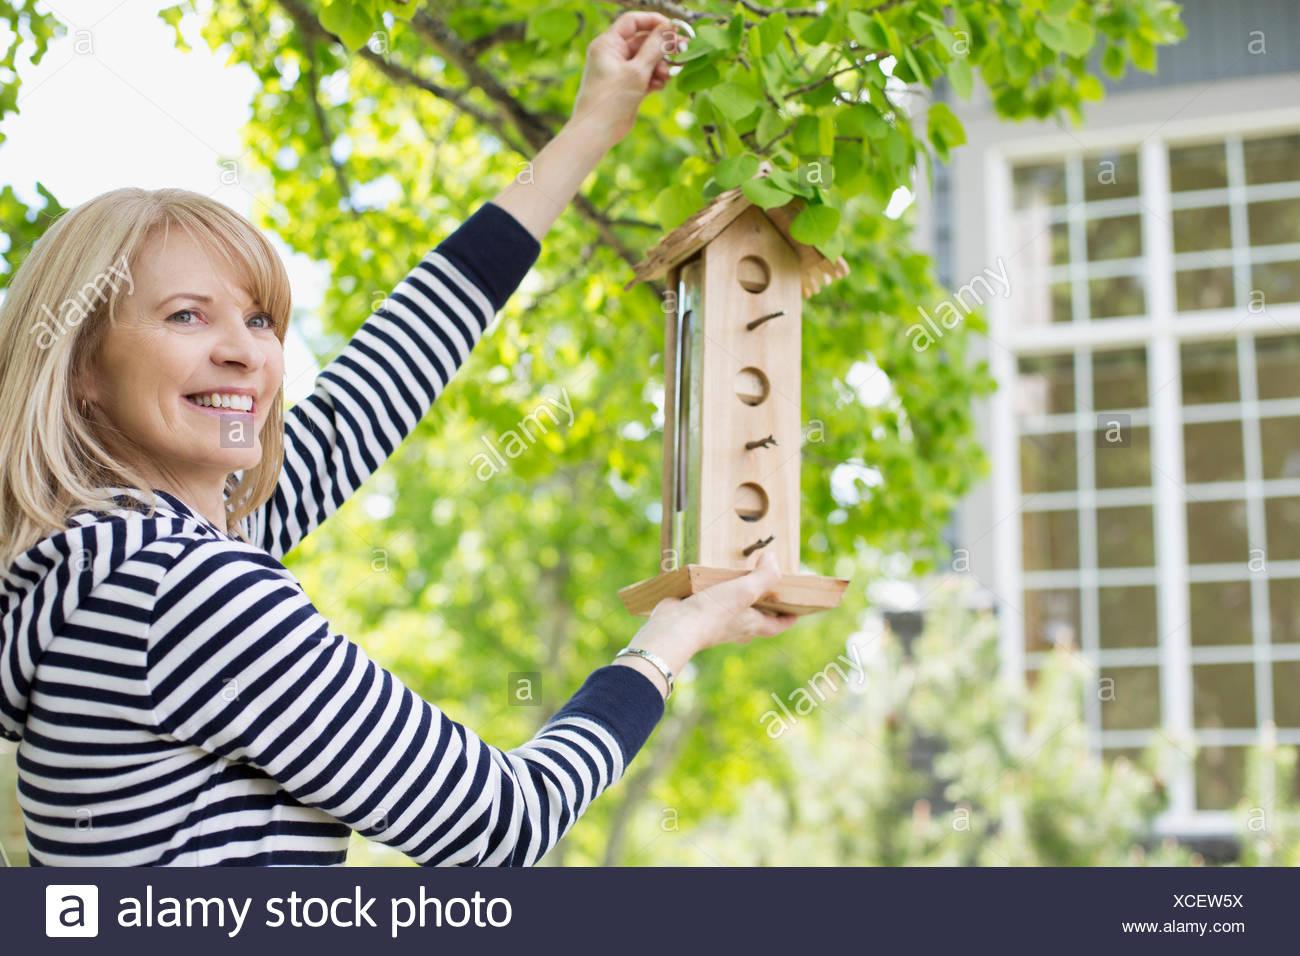 mature woman hanging a bird feeder - Stock Image